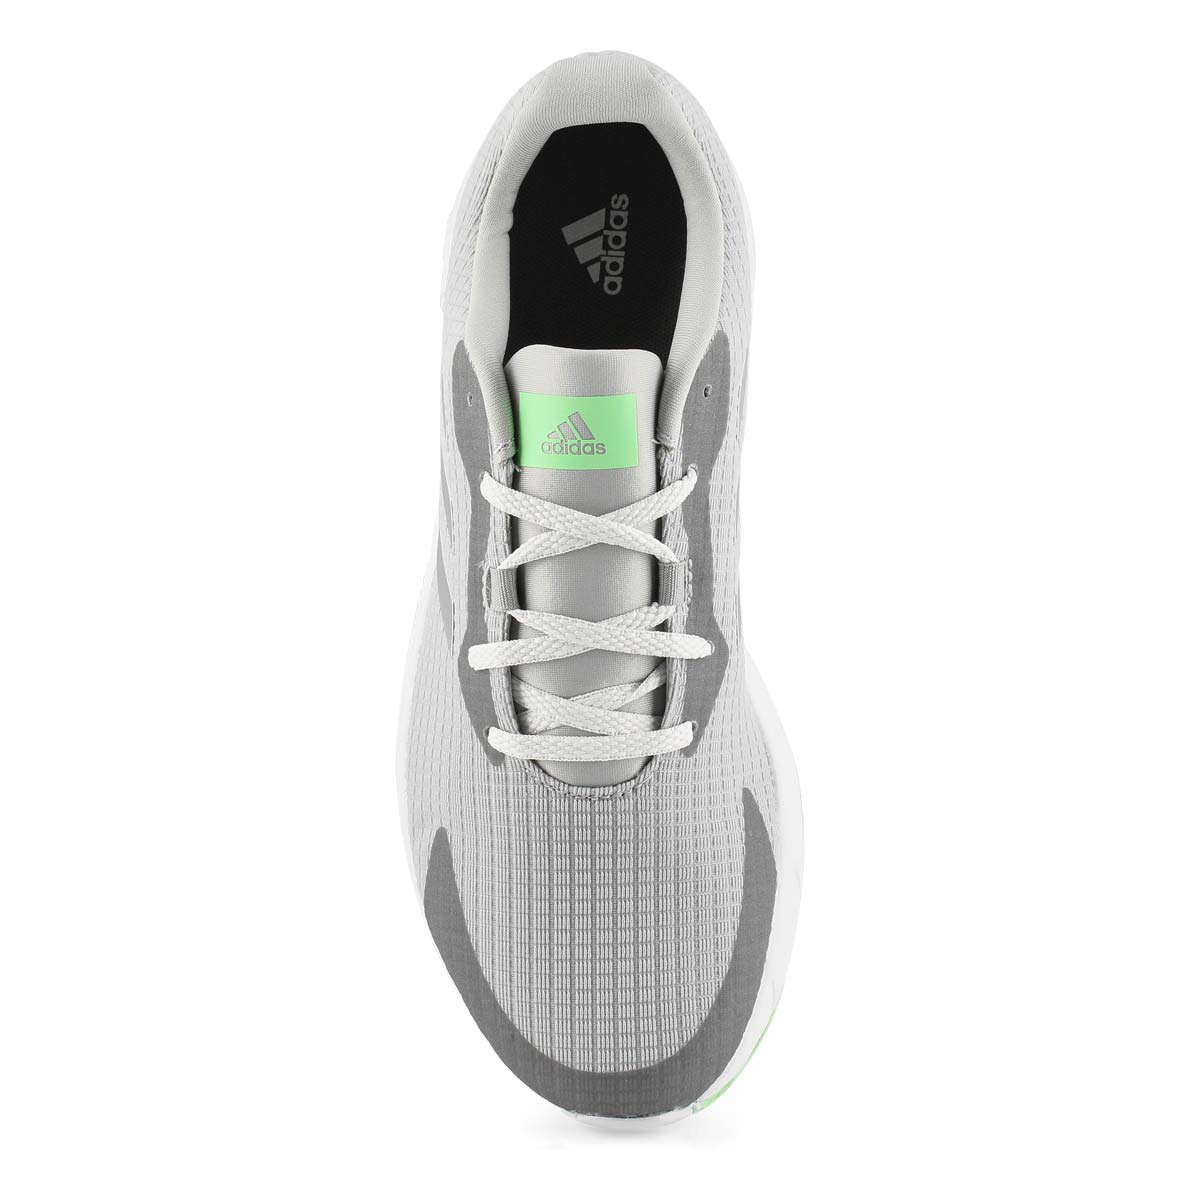 Lds Sooraj grey/silver lace up runner